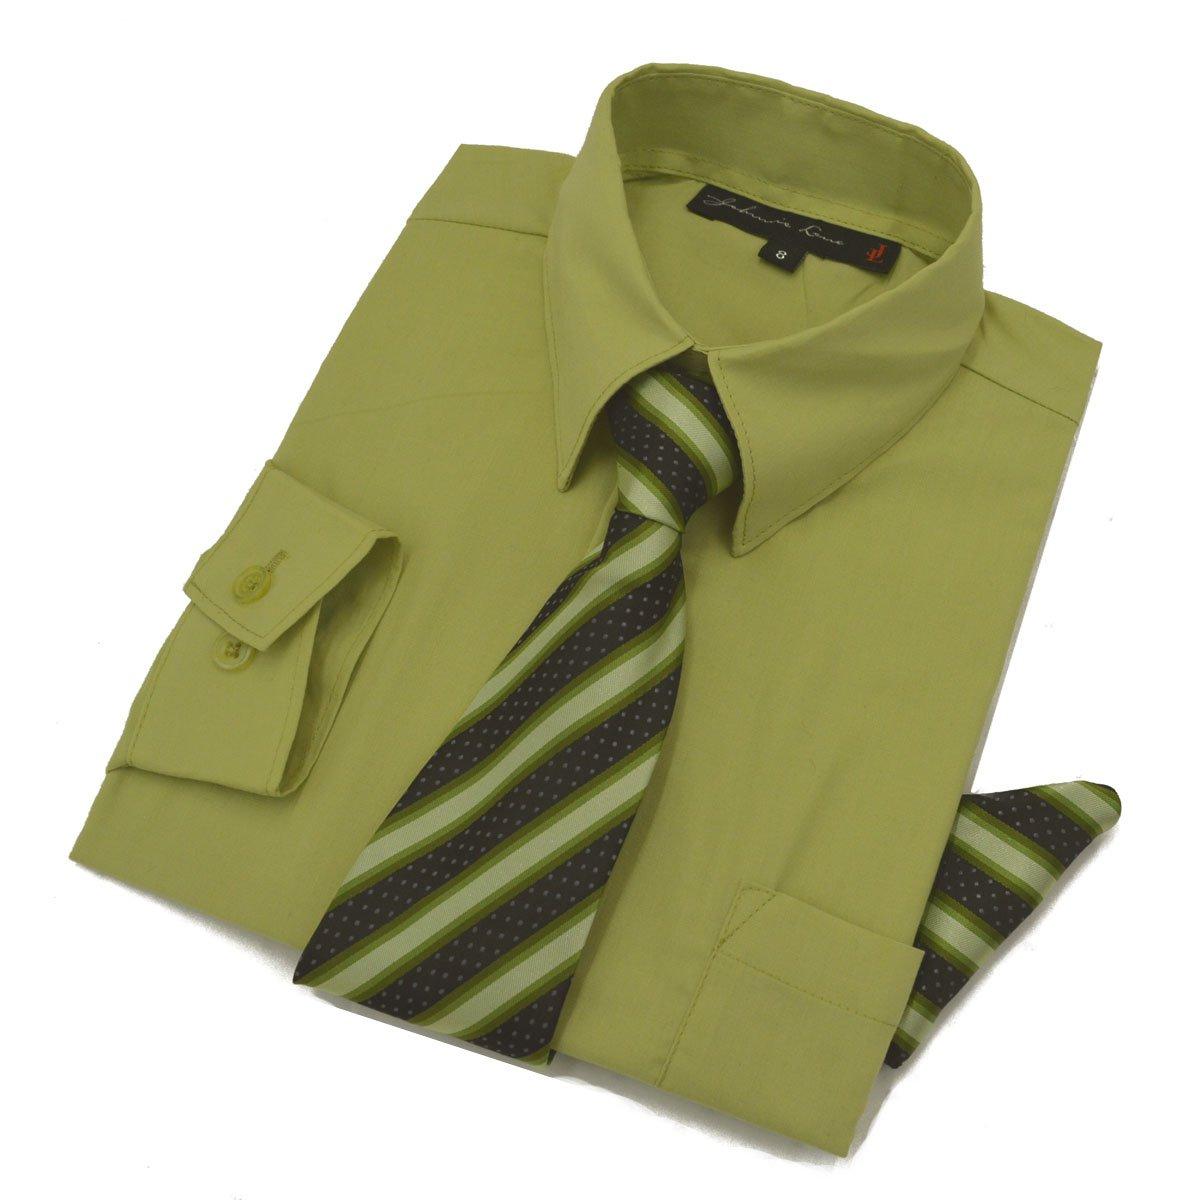 Boys Dress Shirt with Tie and Handkerchief #JL26 (18, Pistachio Green)